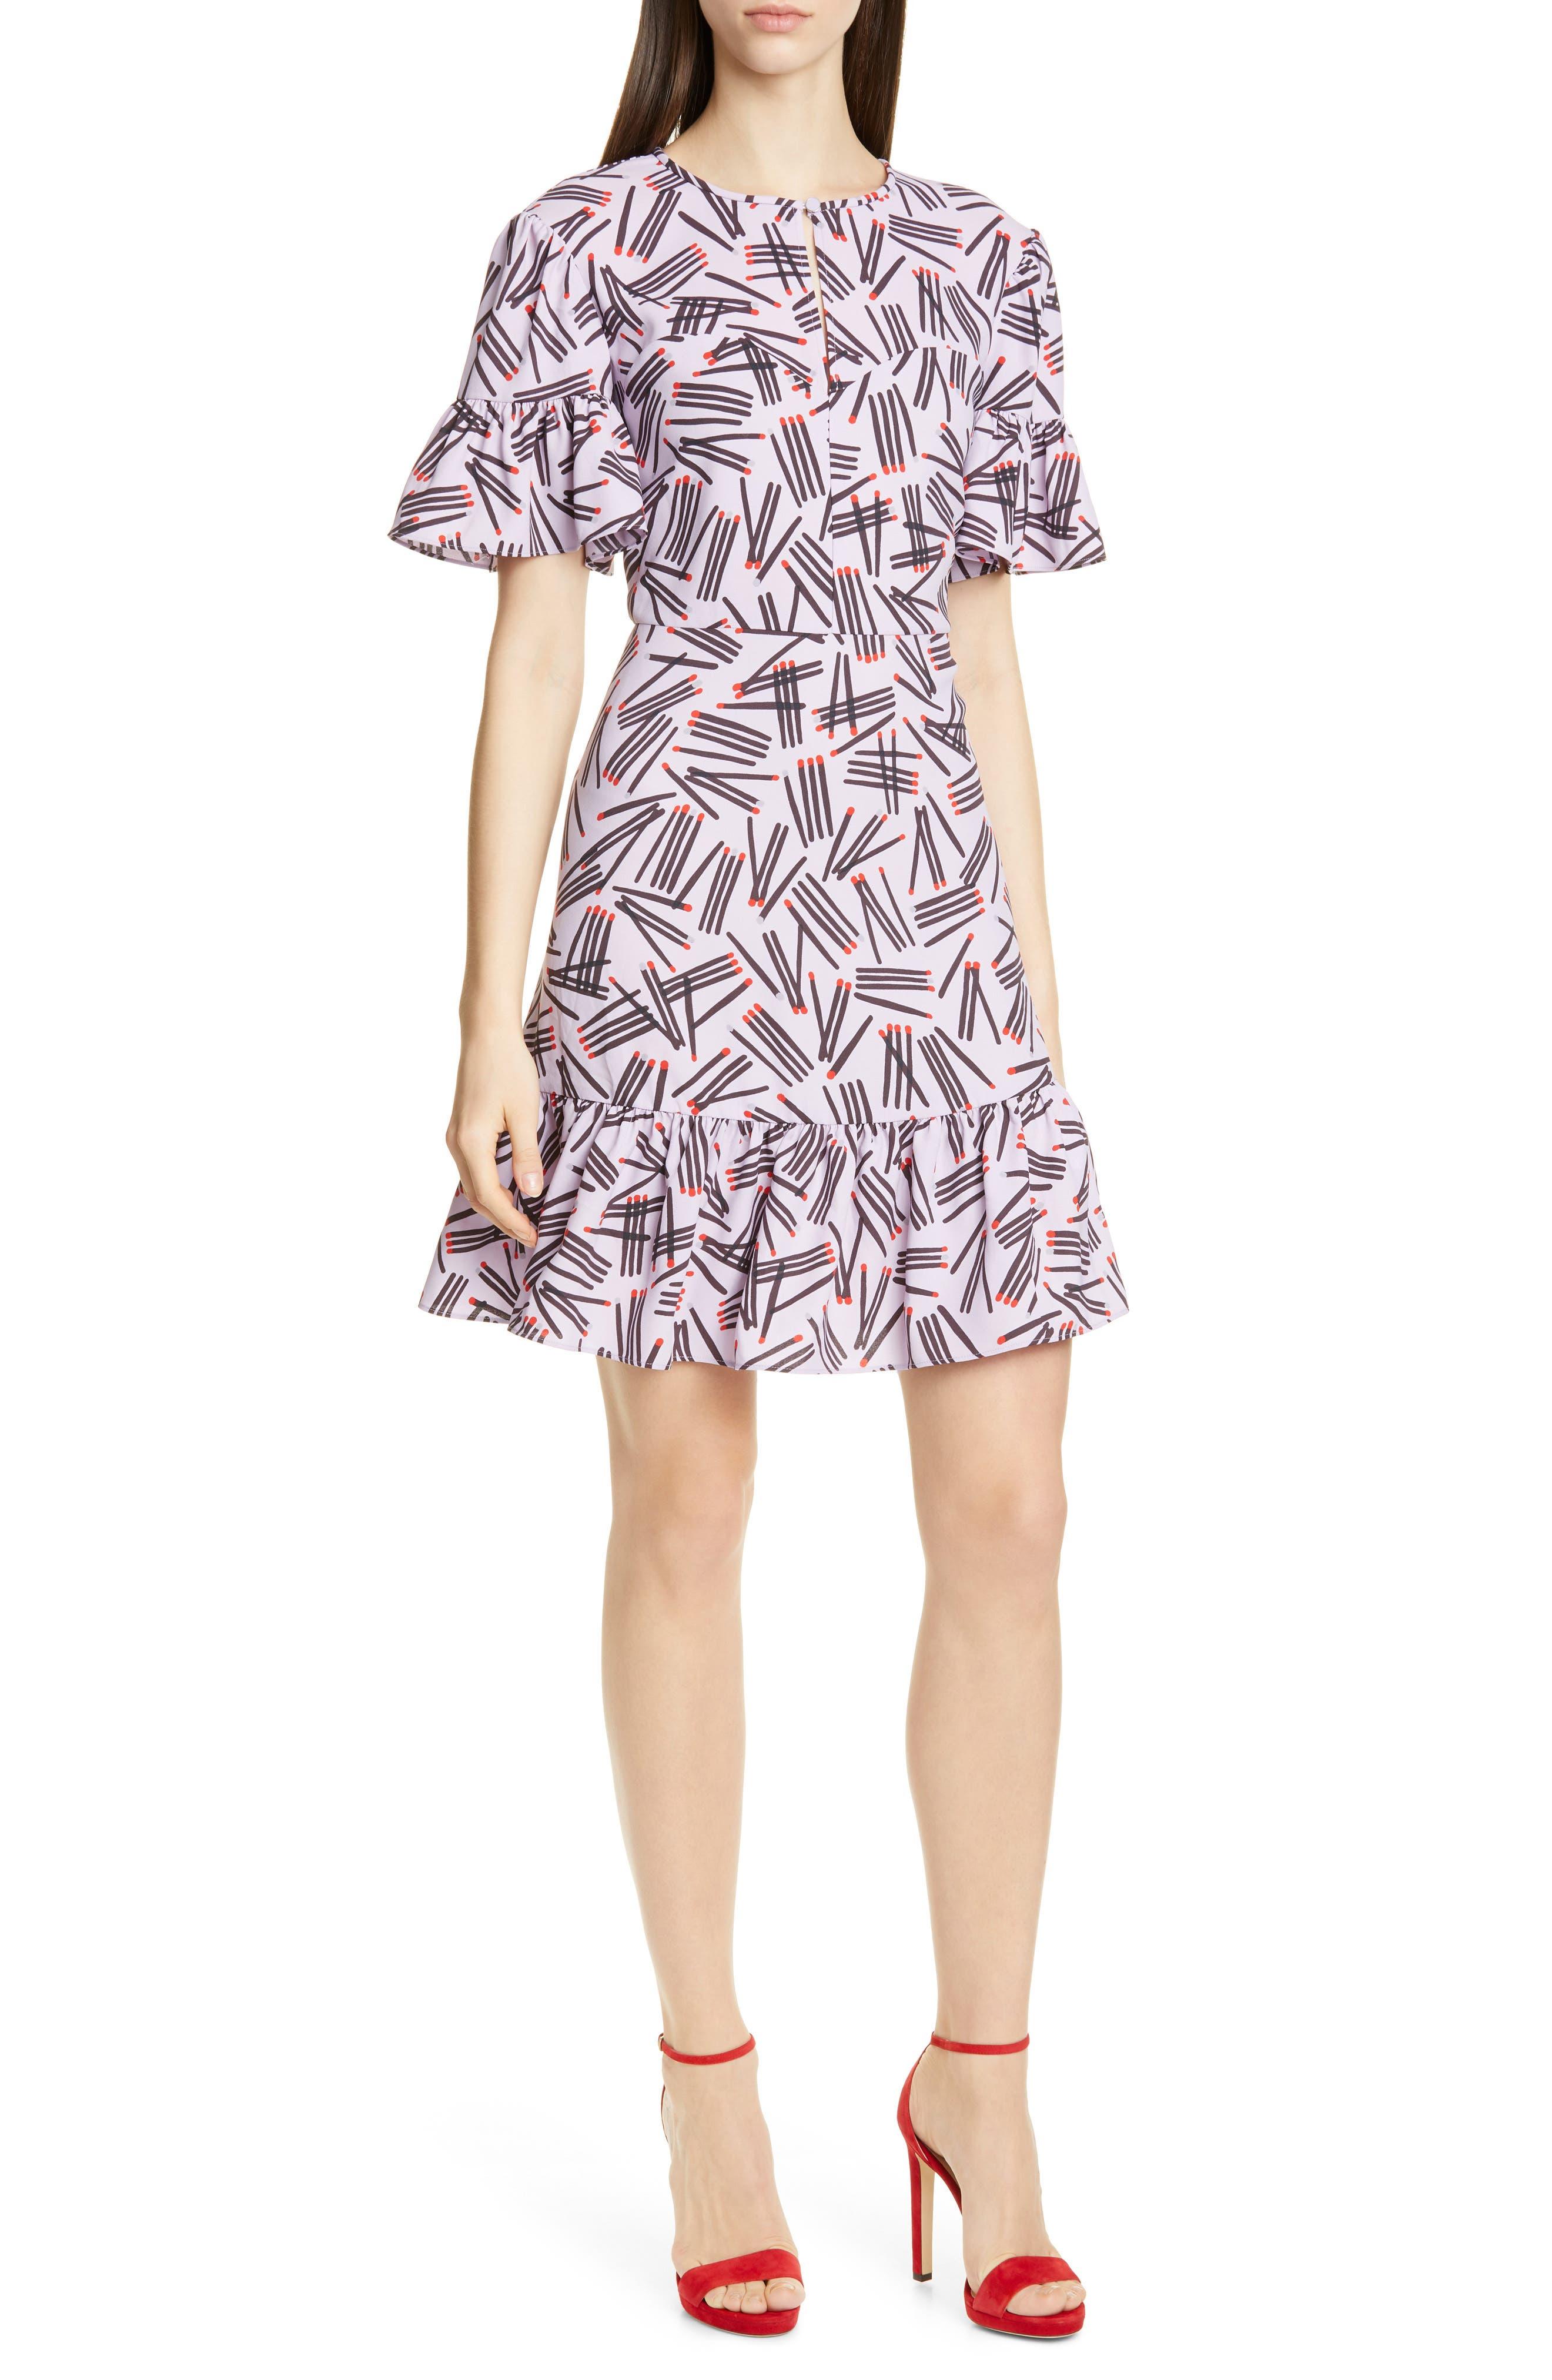 Kate Spade New York Matches Print Ruffle Trim Dress, Purple